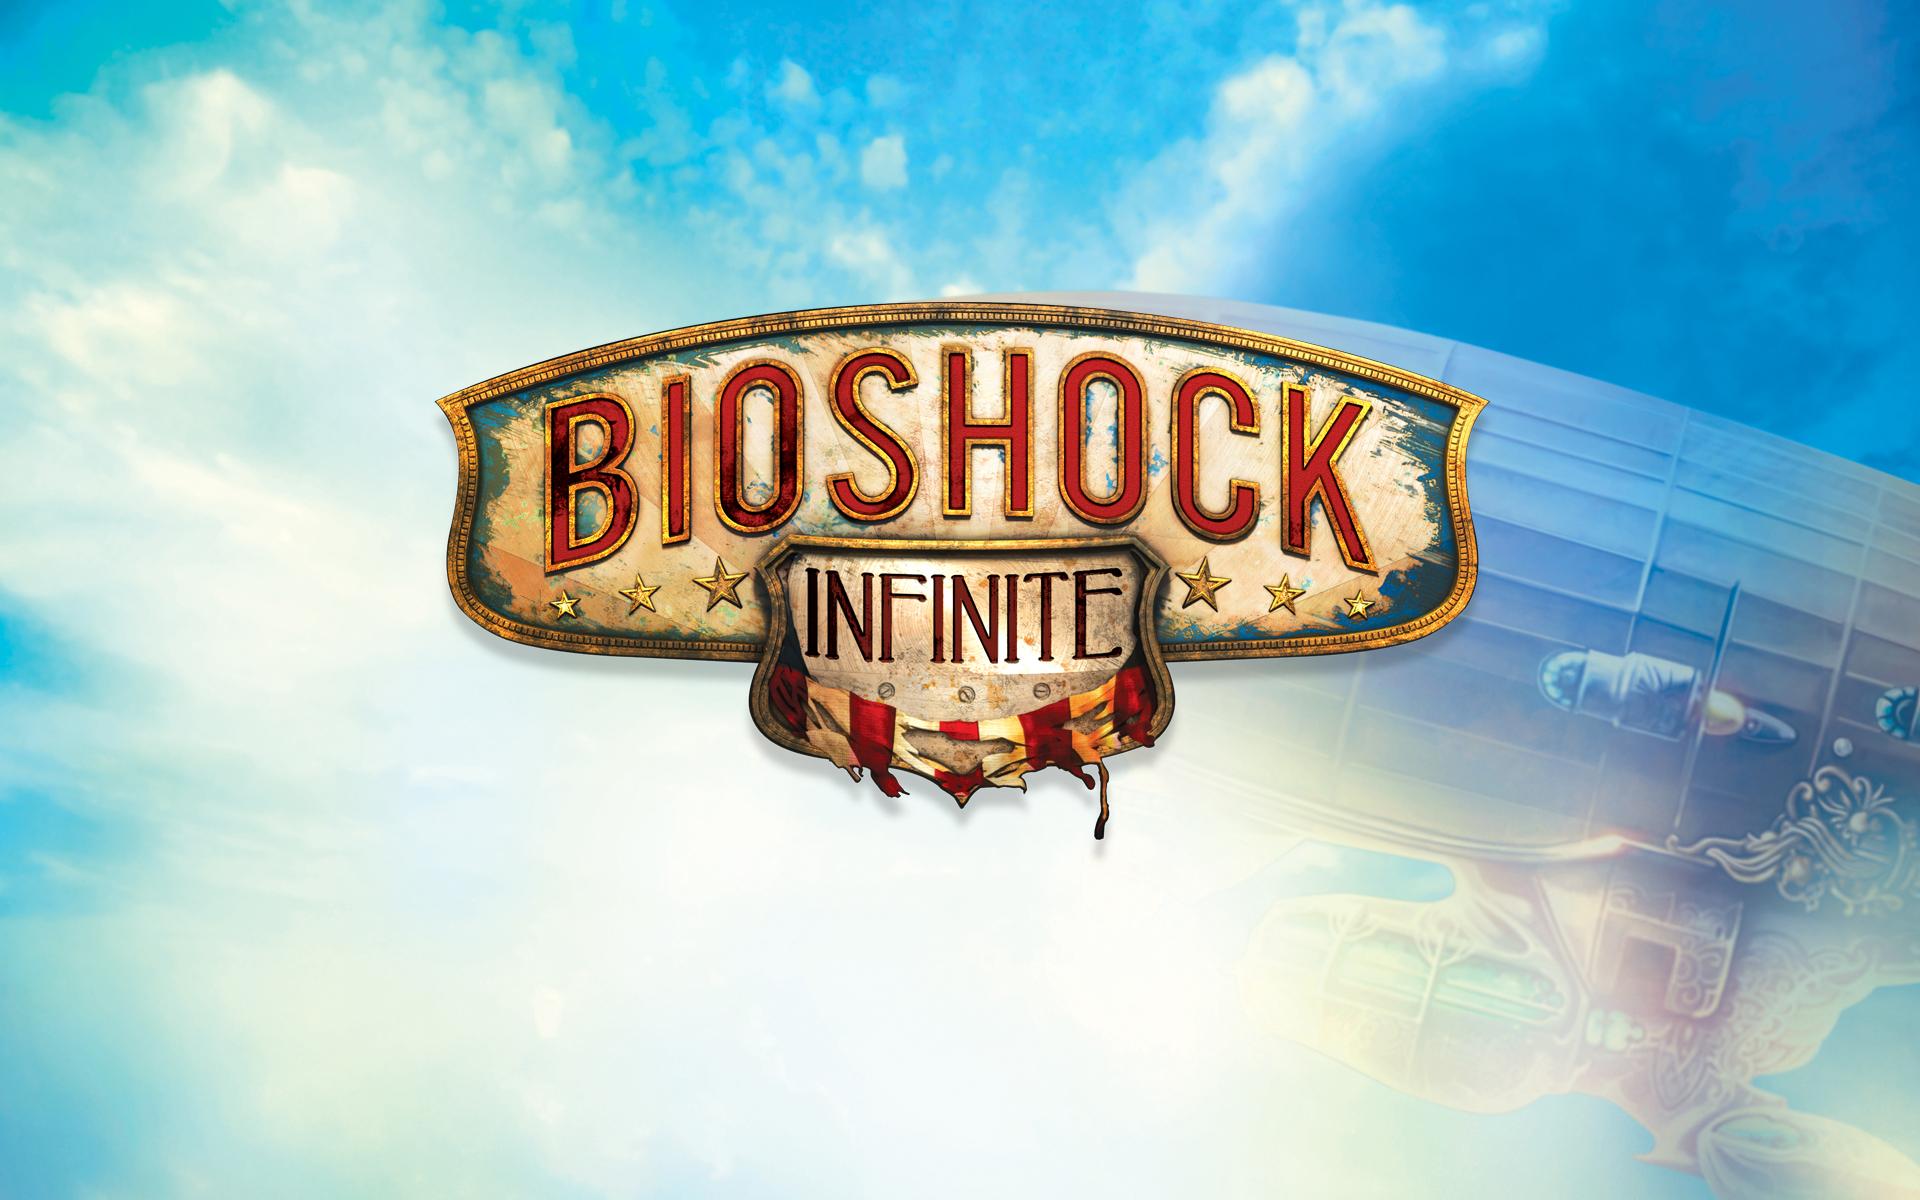 Wallpaper: BioShock Infinite. Wide | Standard